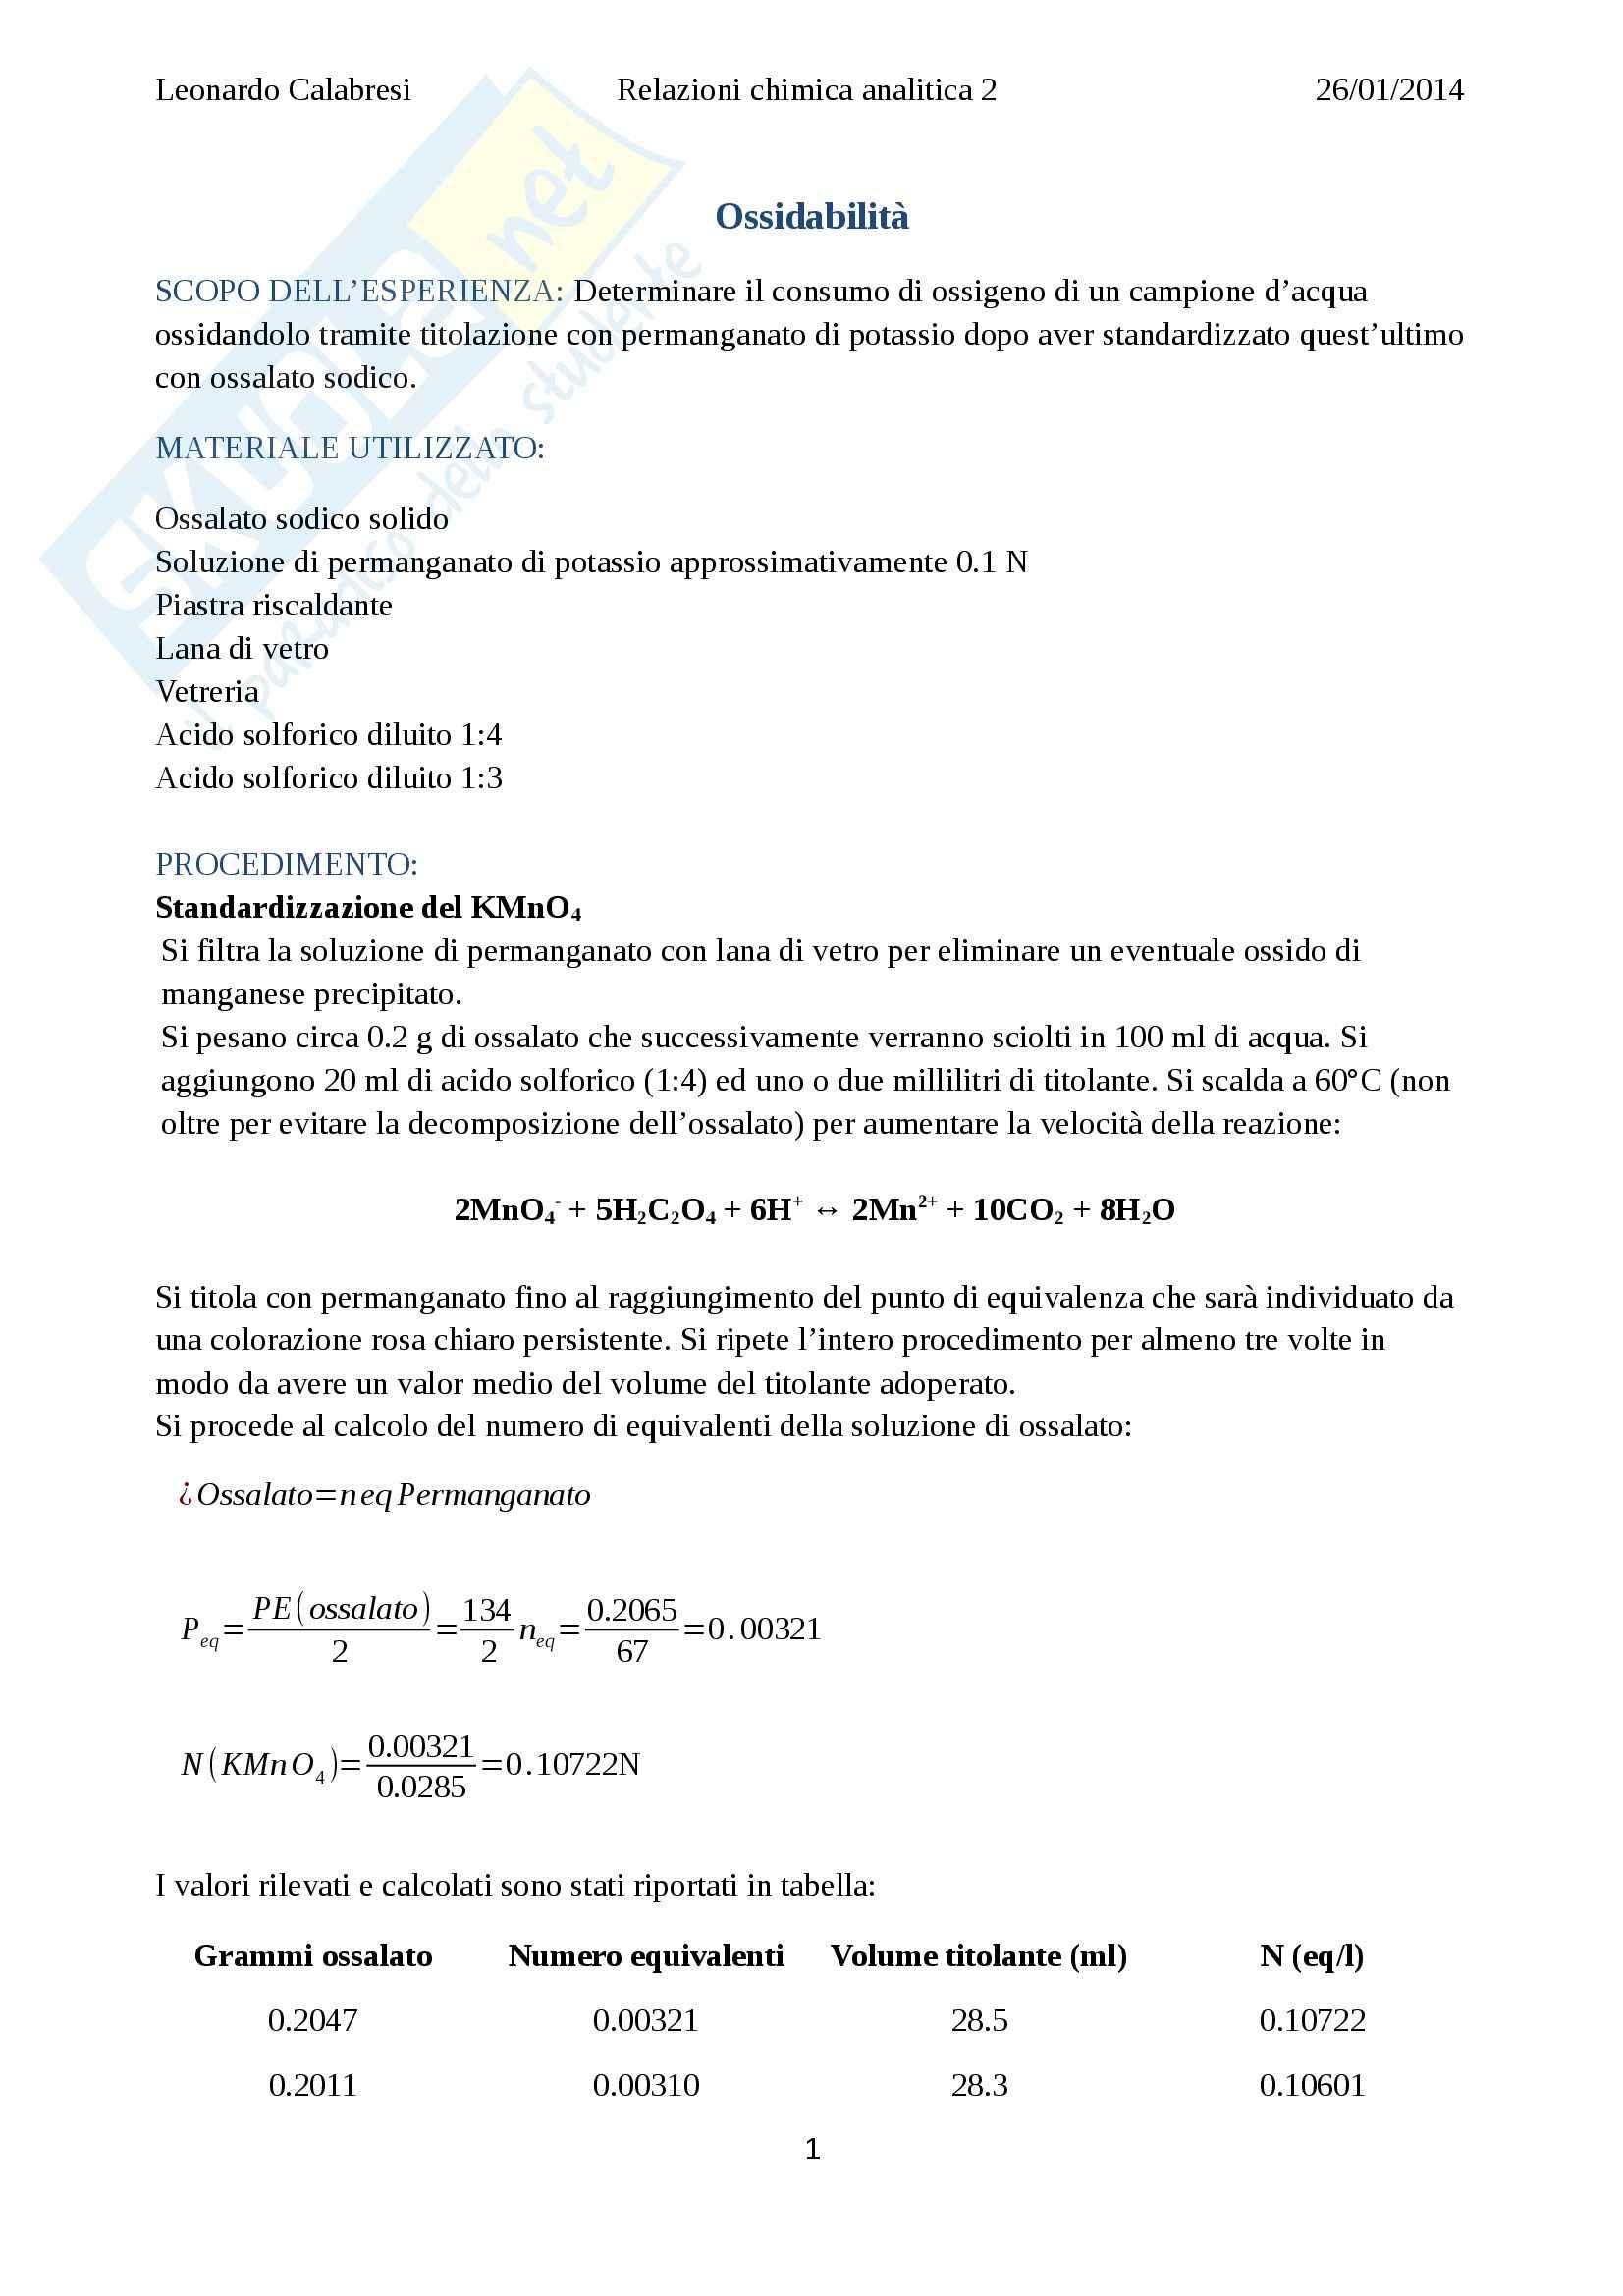 Relazione ossidabilità, Chimica analitica II